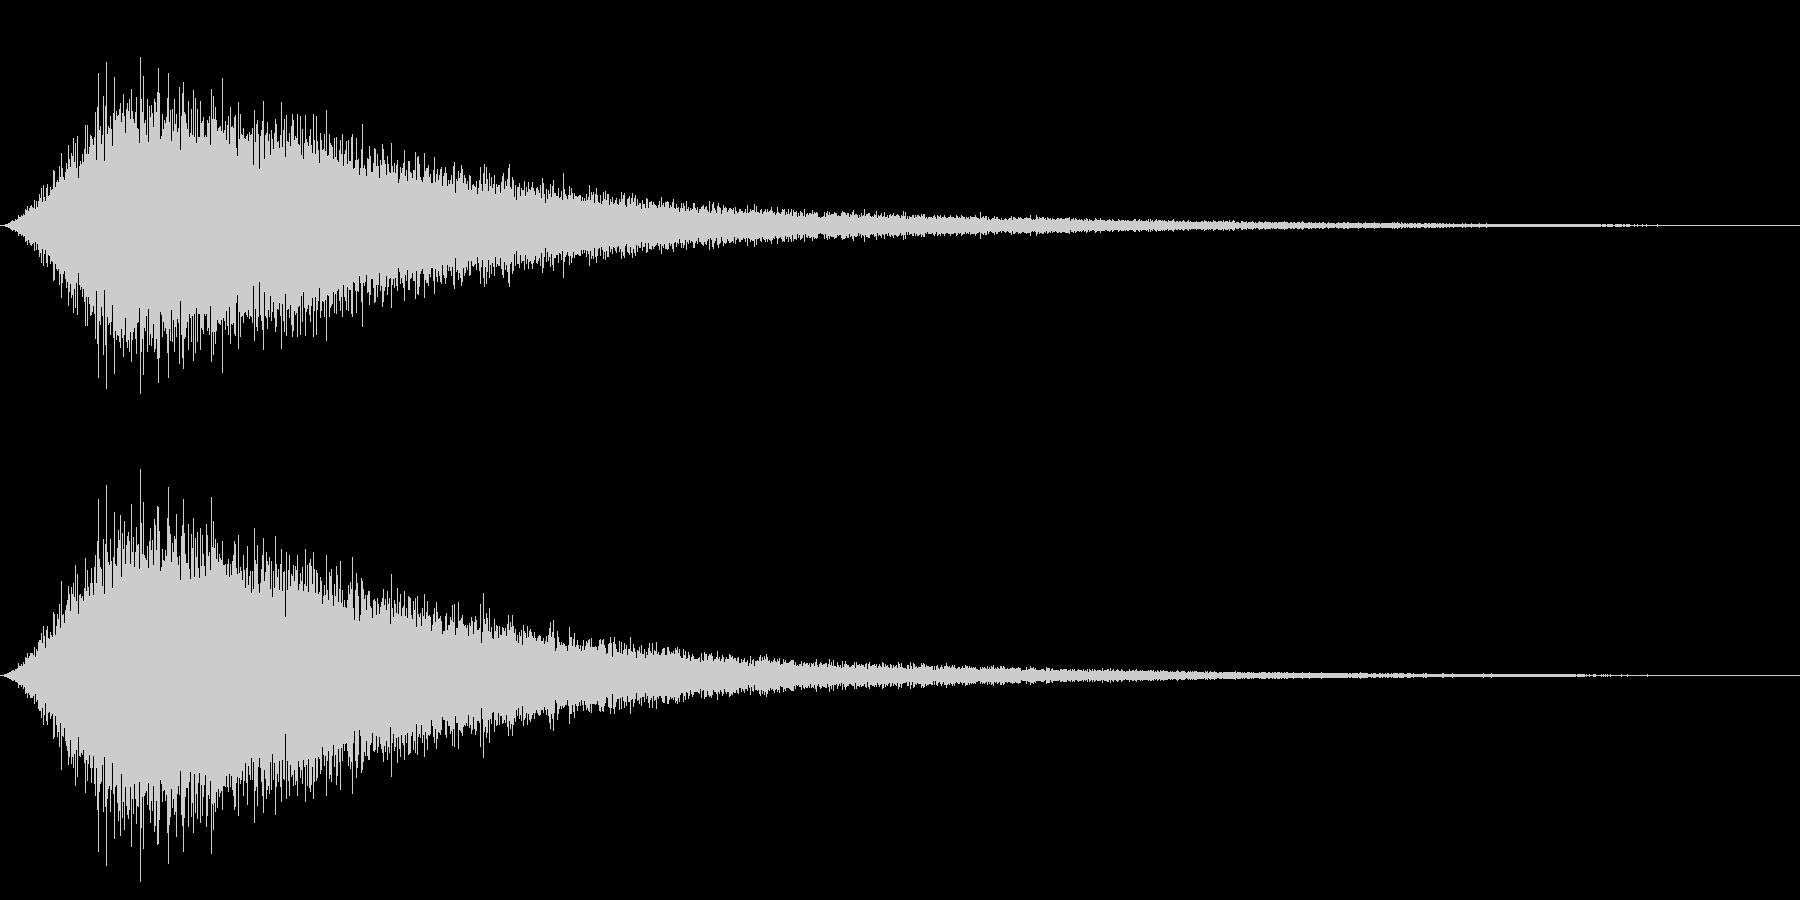 NAMIOTO 波の音 ワンショット音源の未再生の波形